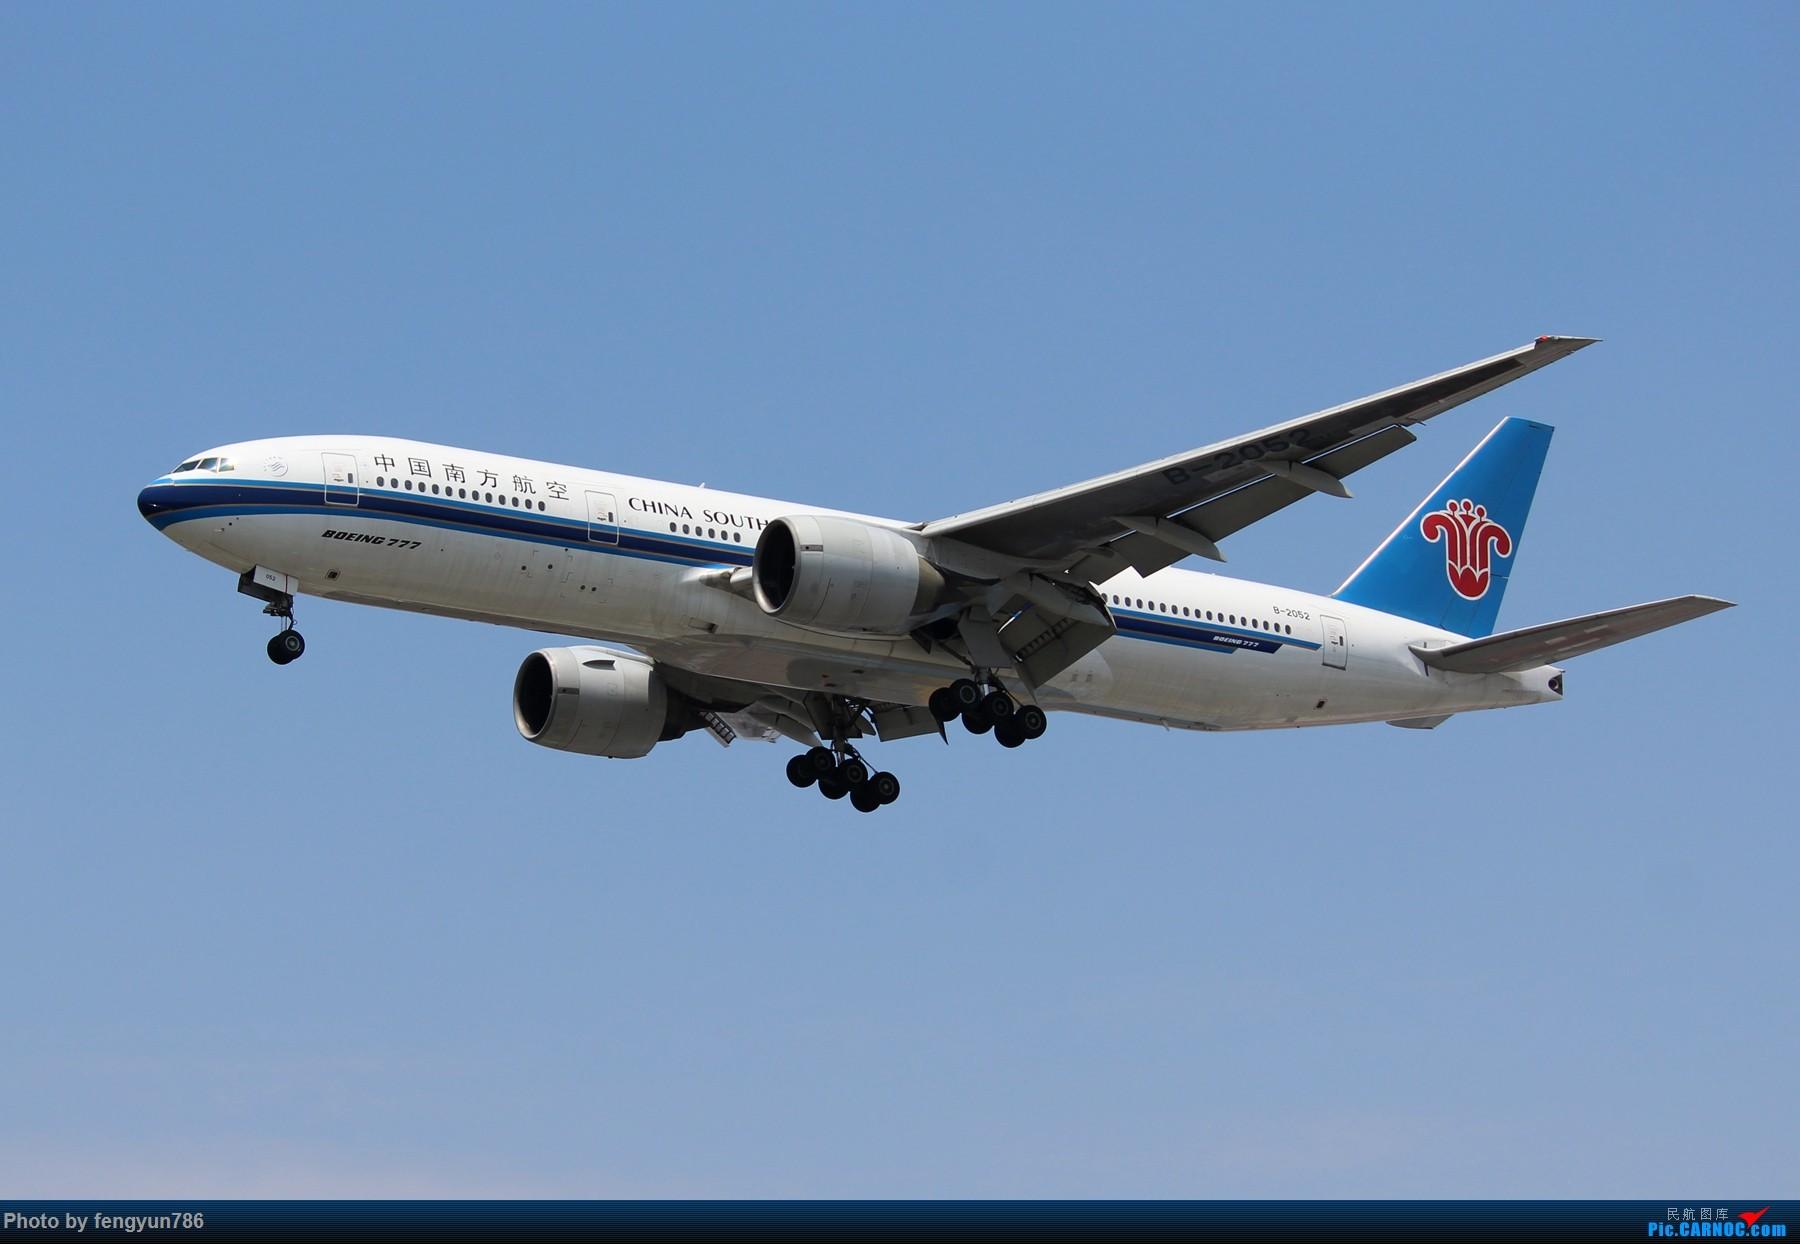 Re:[原创]7.19的SHA,天晴温高,发几个跟前一天不一样的。 BOEING 777-200 B-2052 中国上海虹桥国际机场